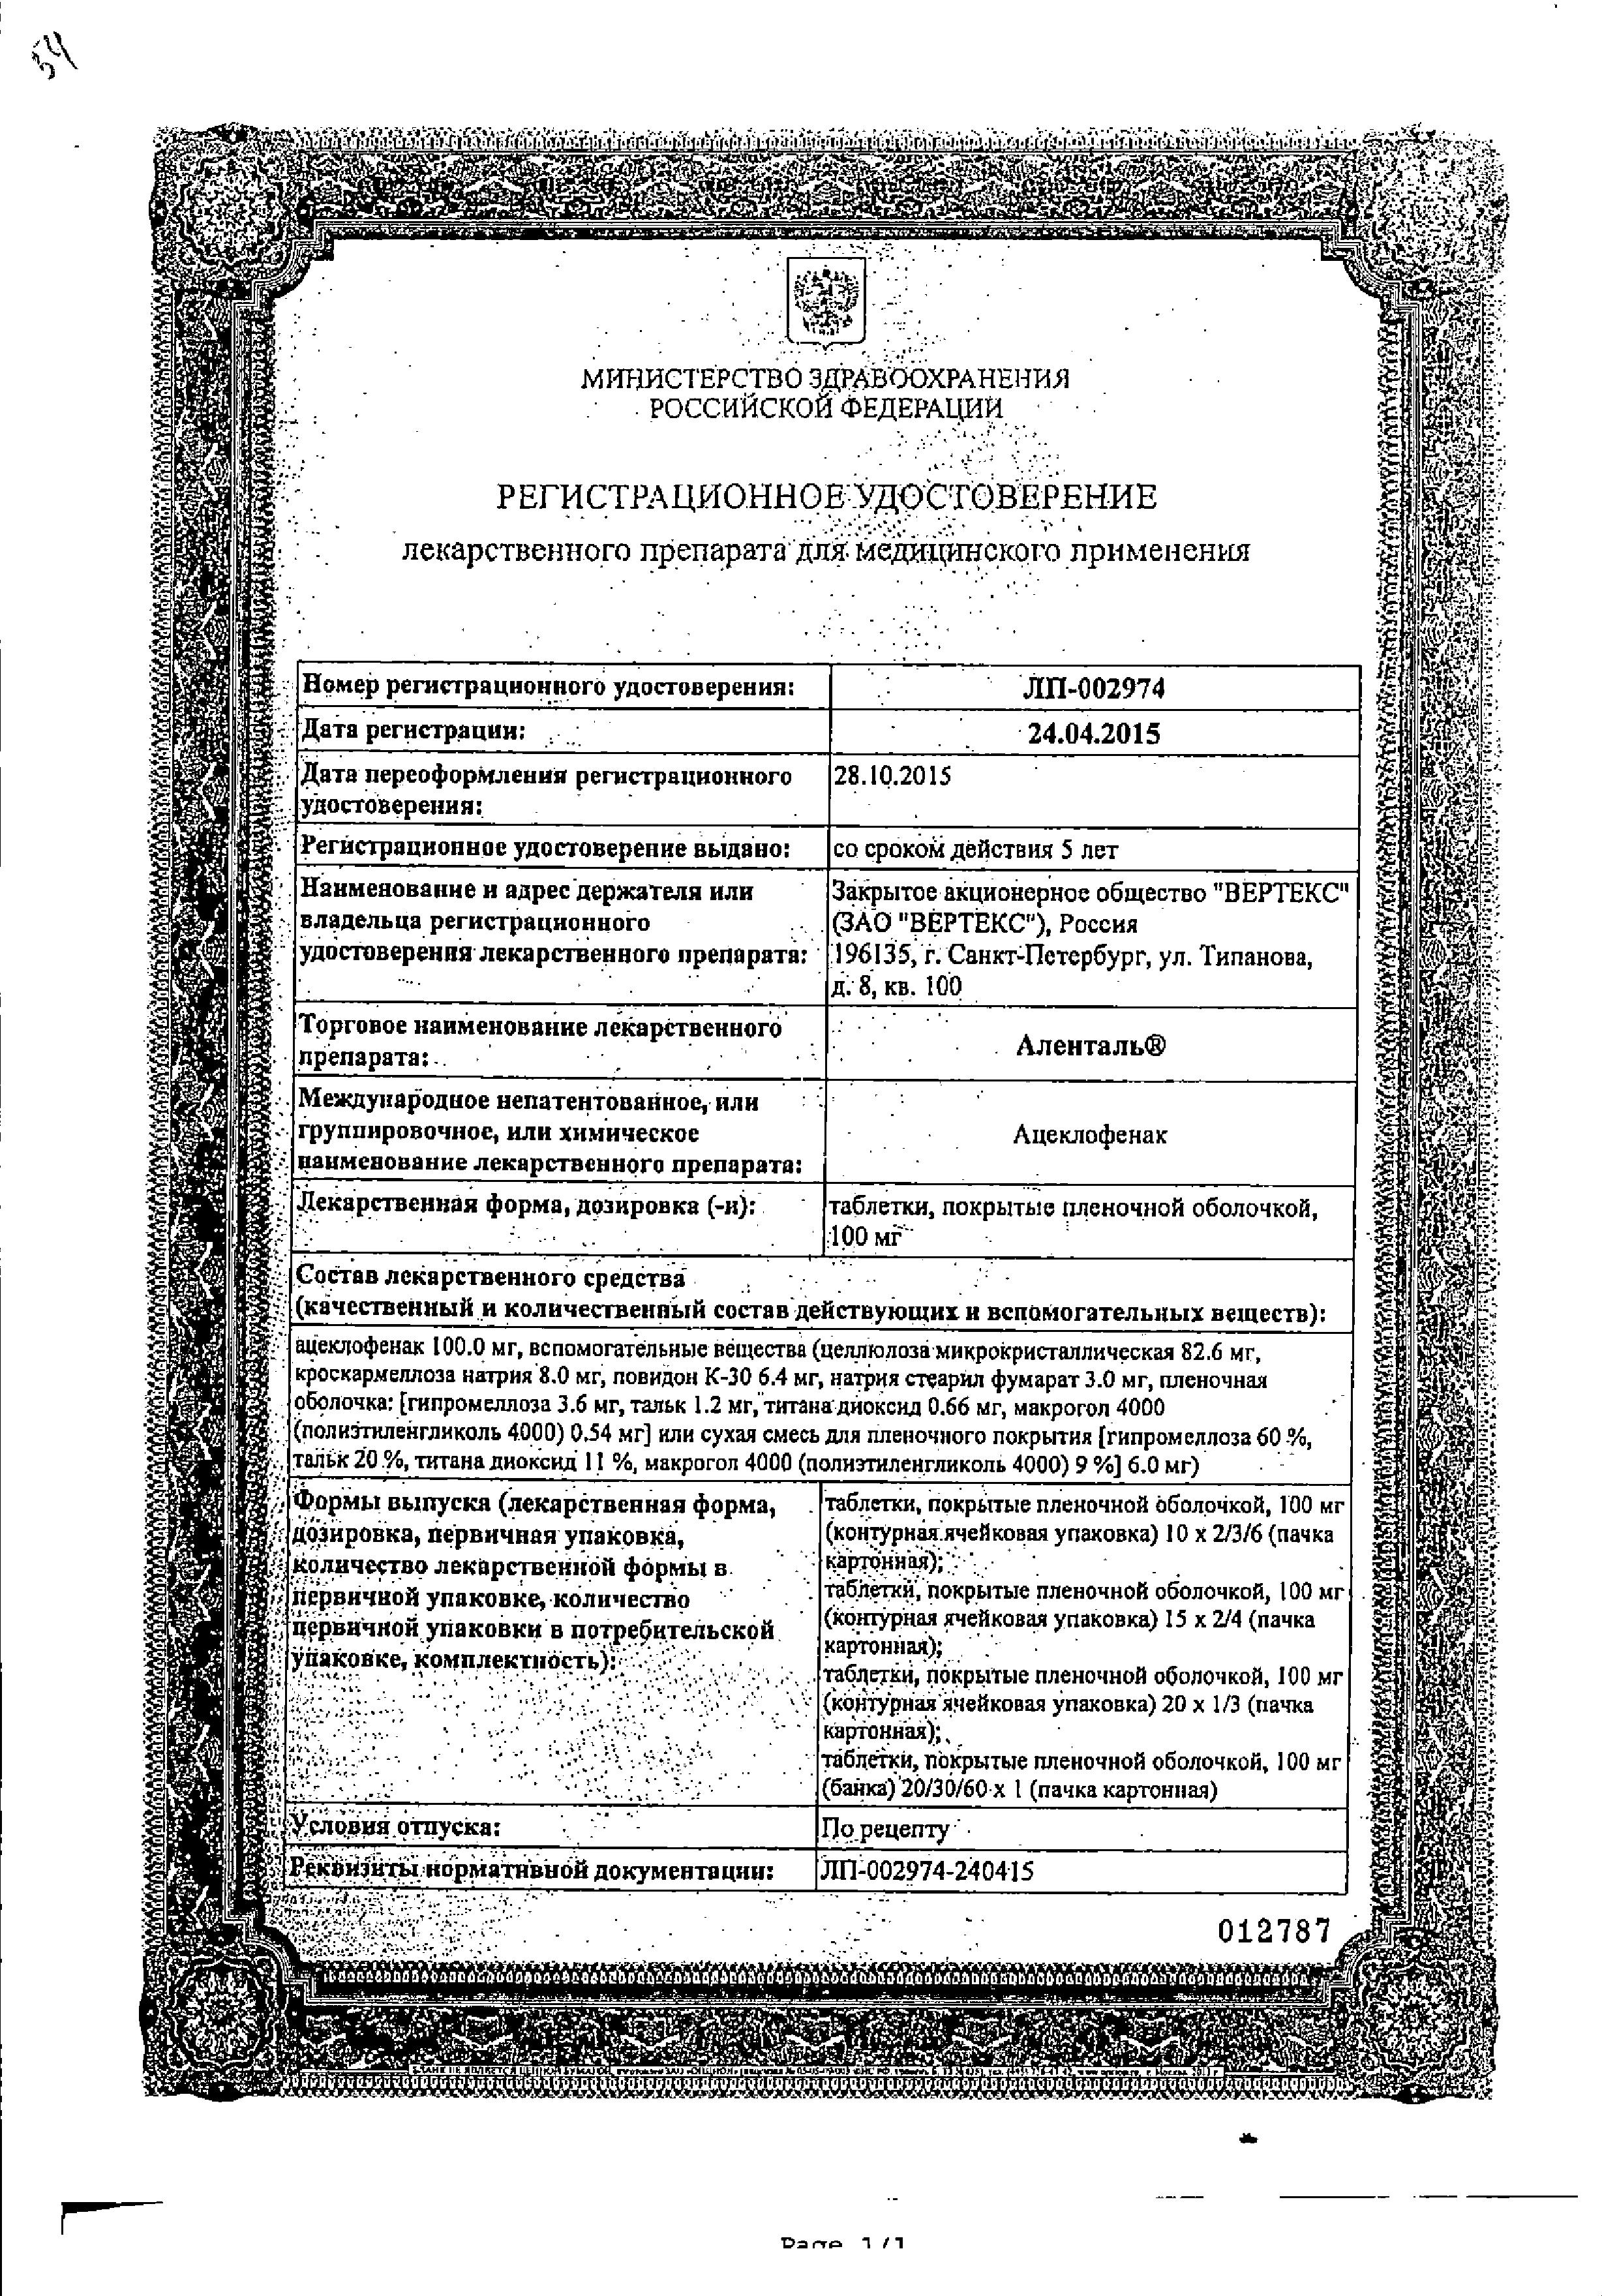 Аленталь сертификат